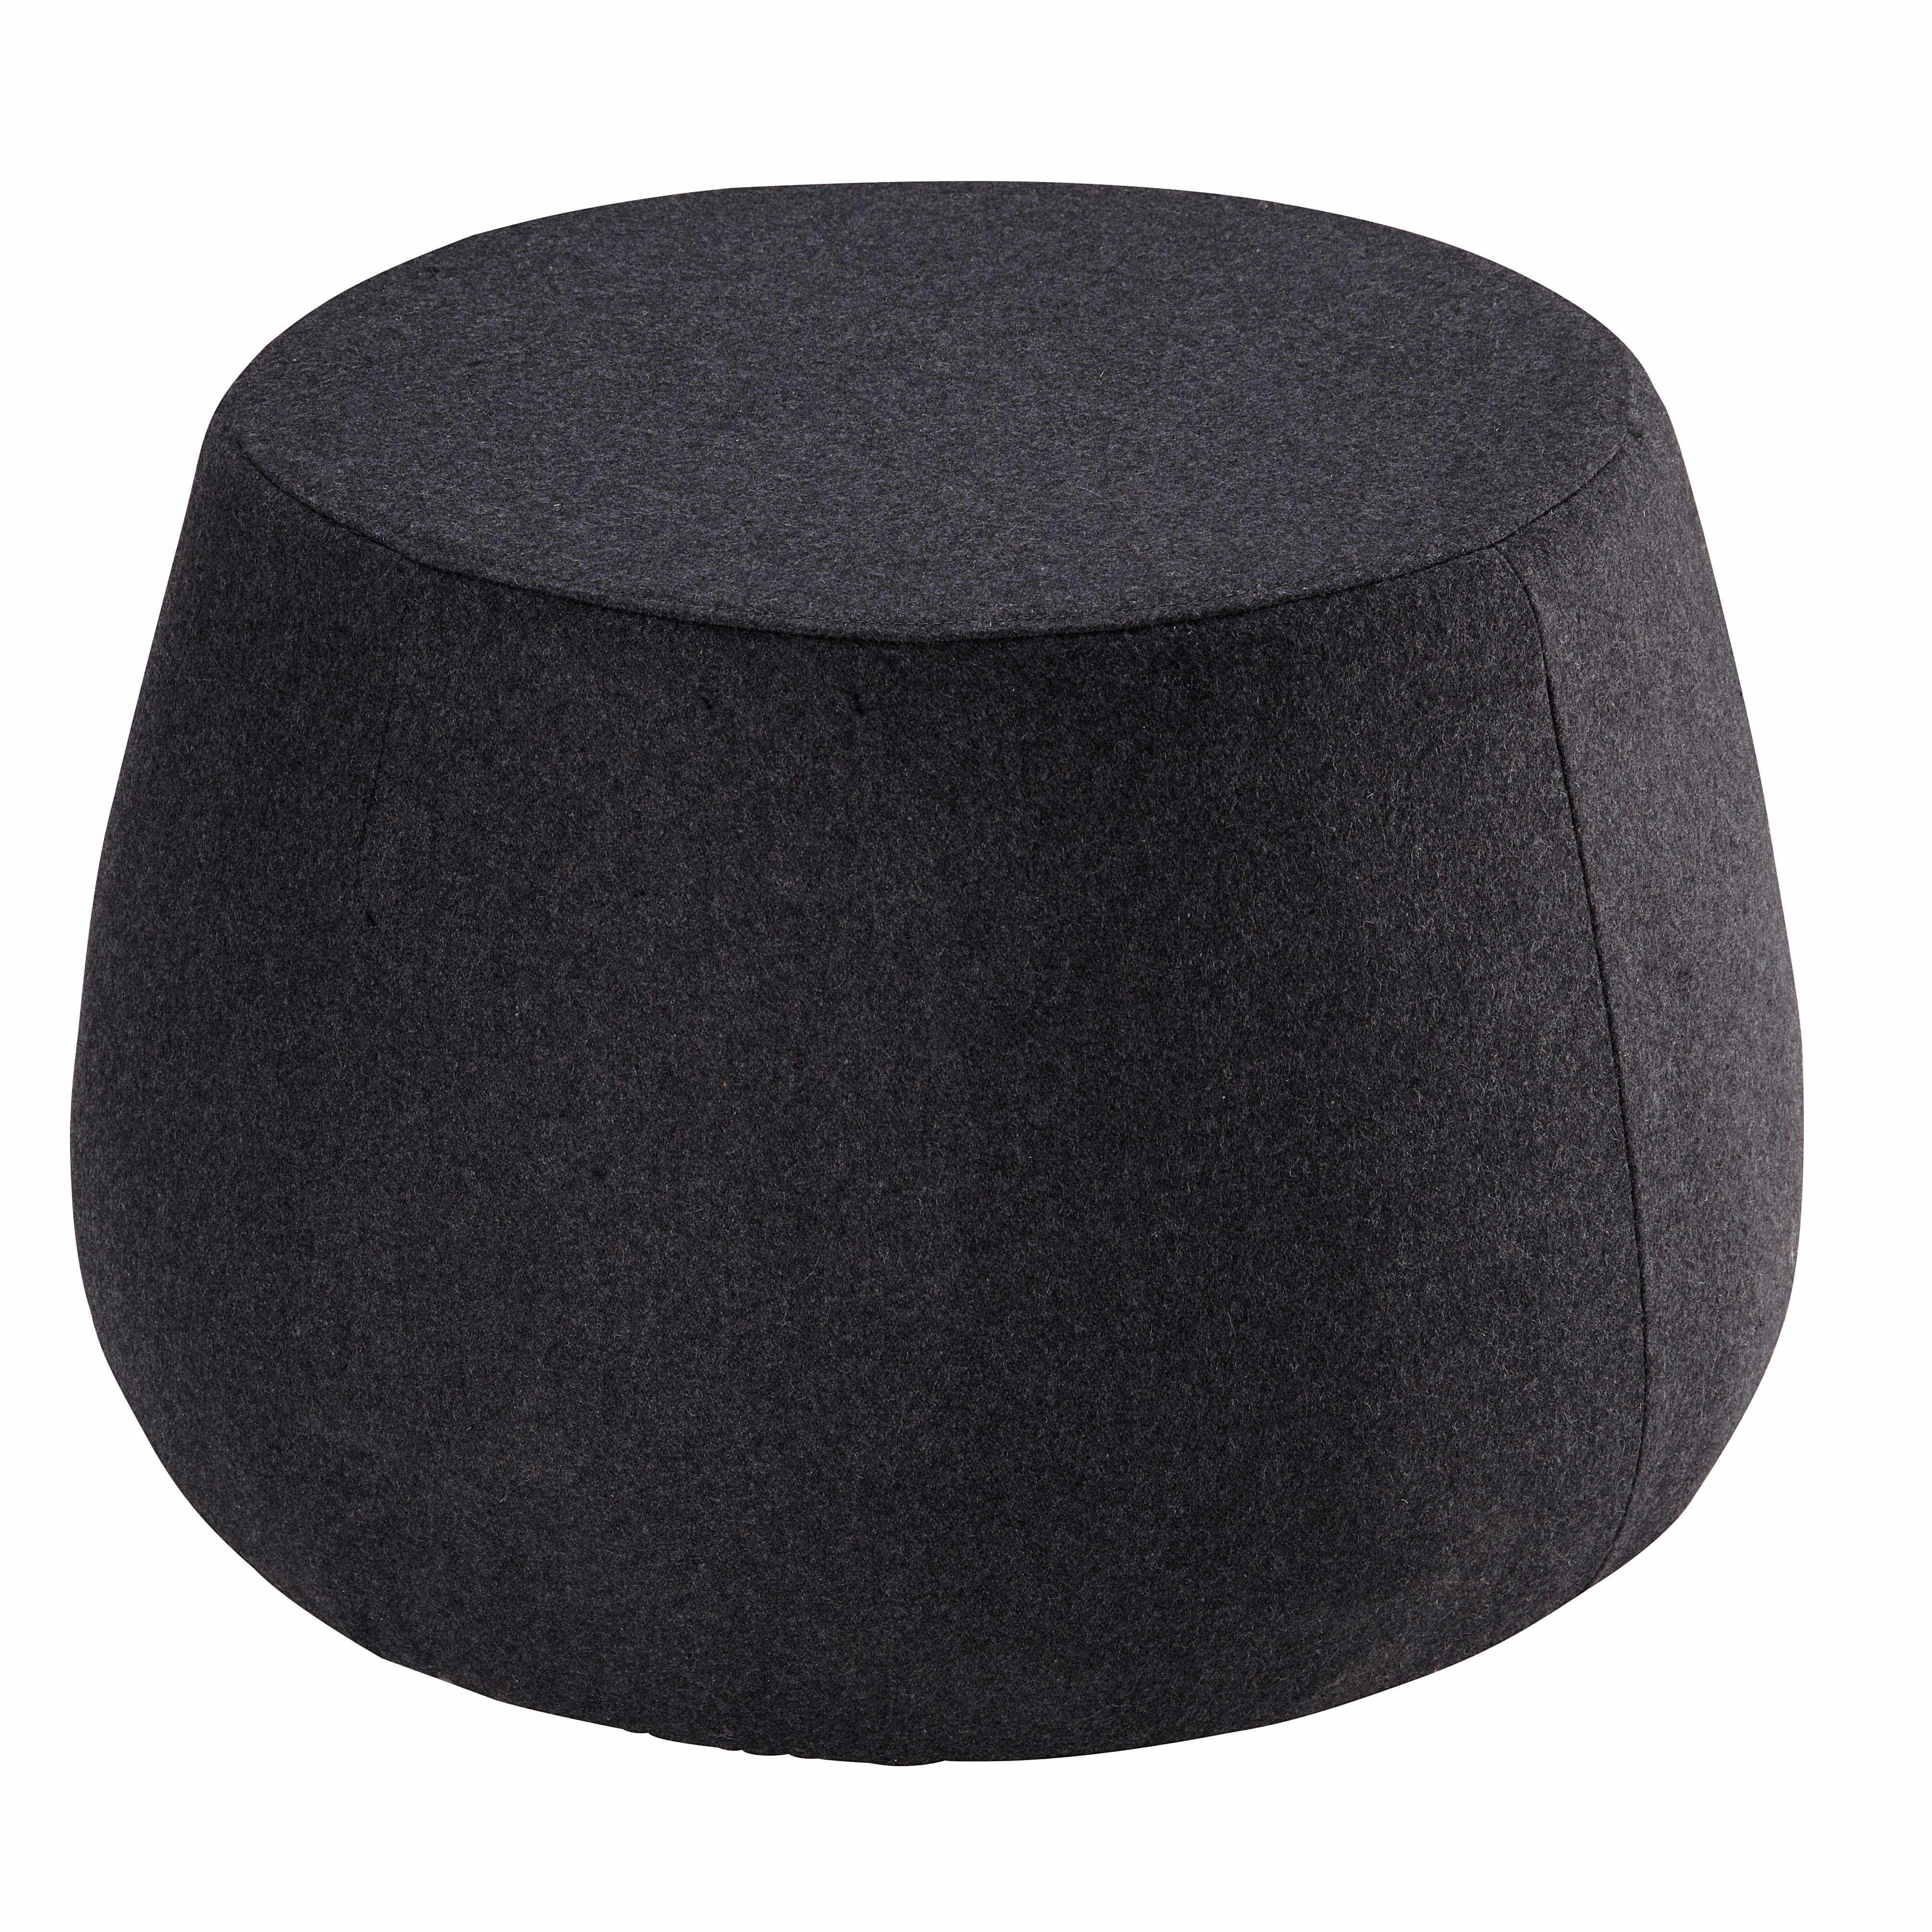 Nackenrolle Ikea anthracite fabric pouffe garett footstools